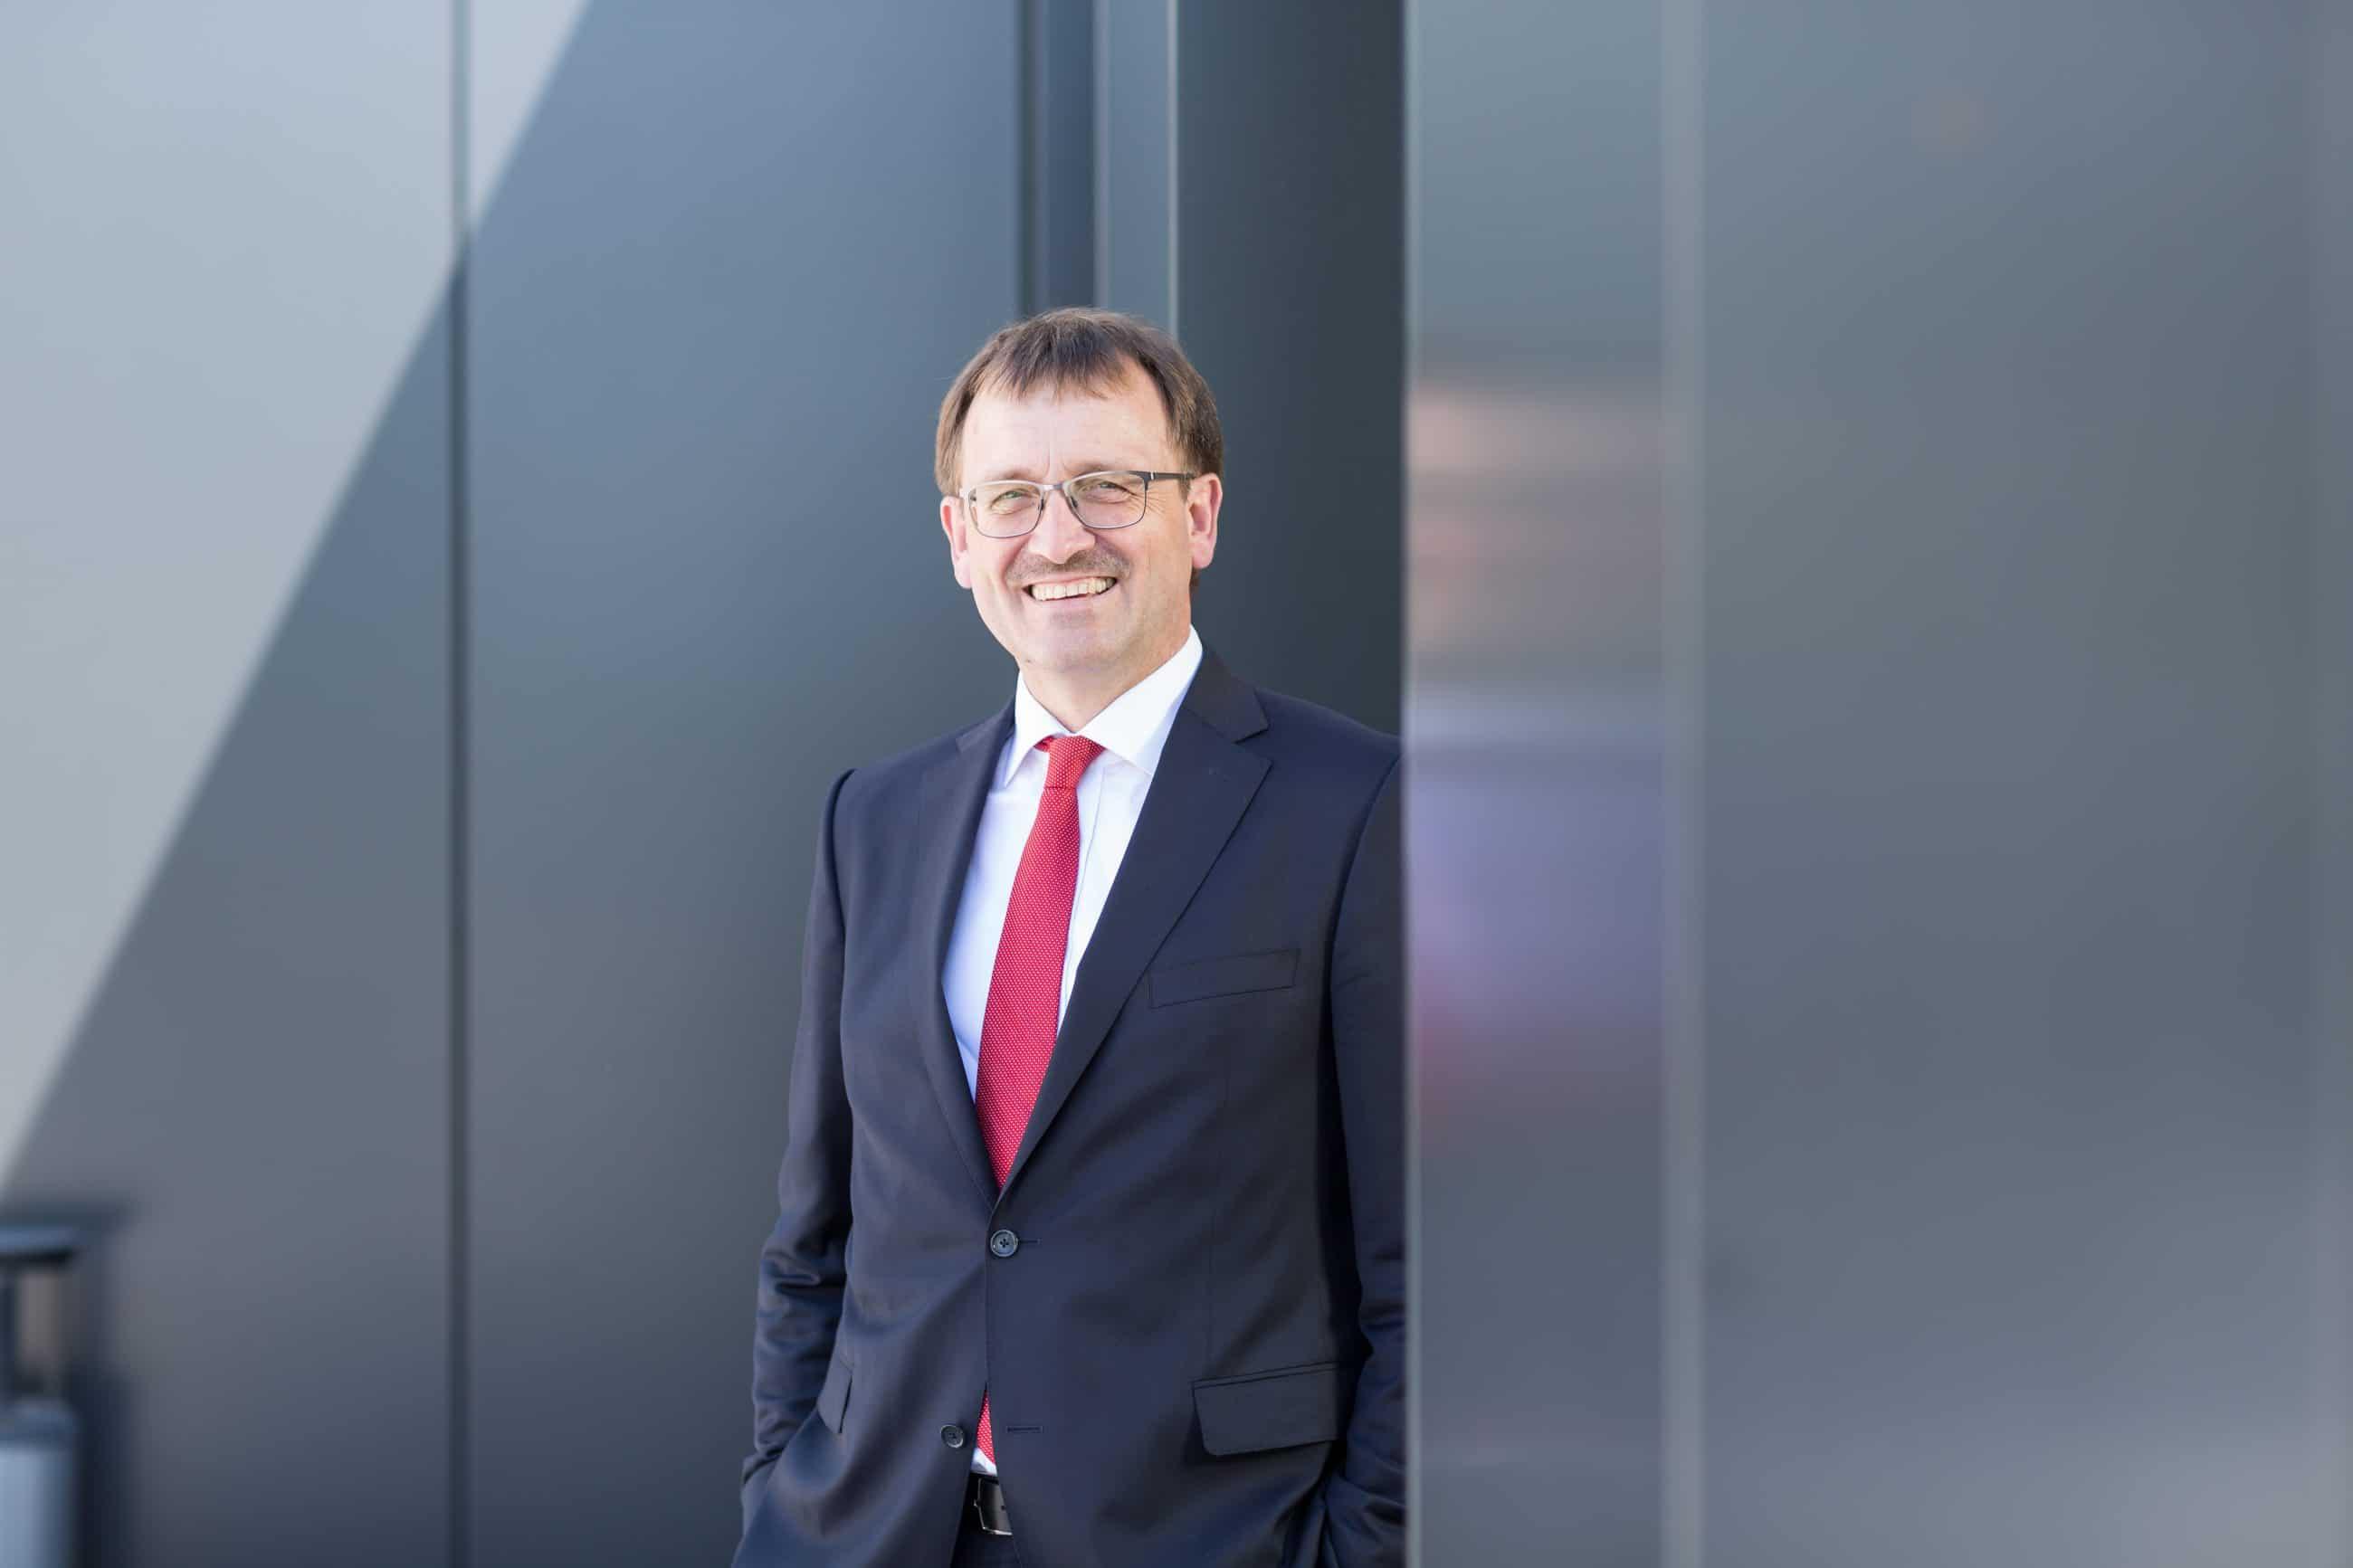 GBG Geschäftsführer Karl-Heinz Frings